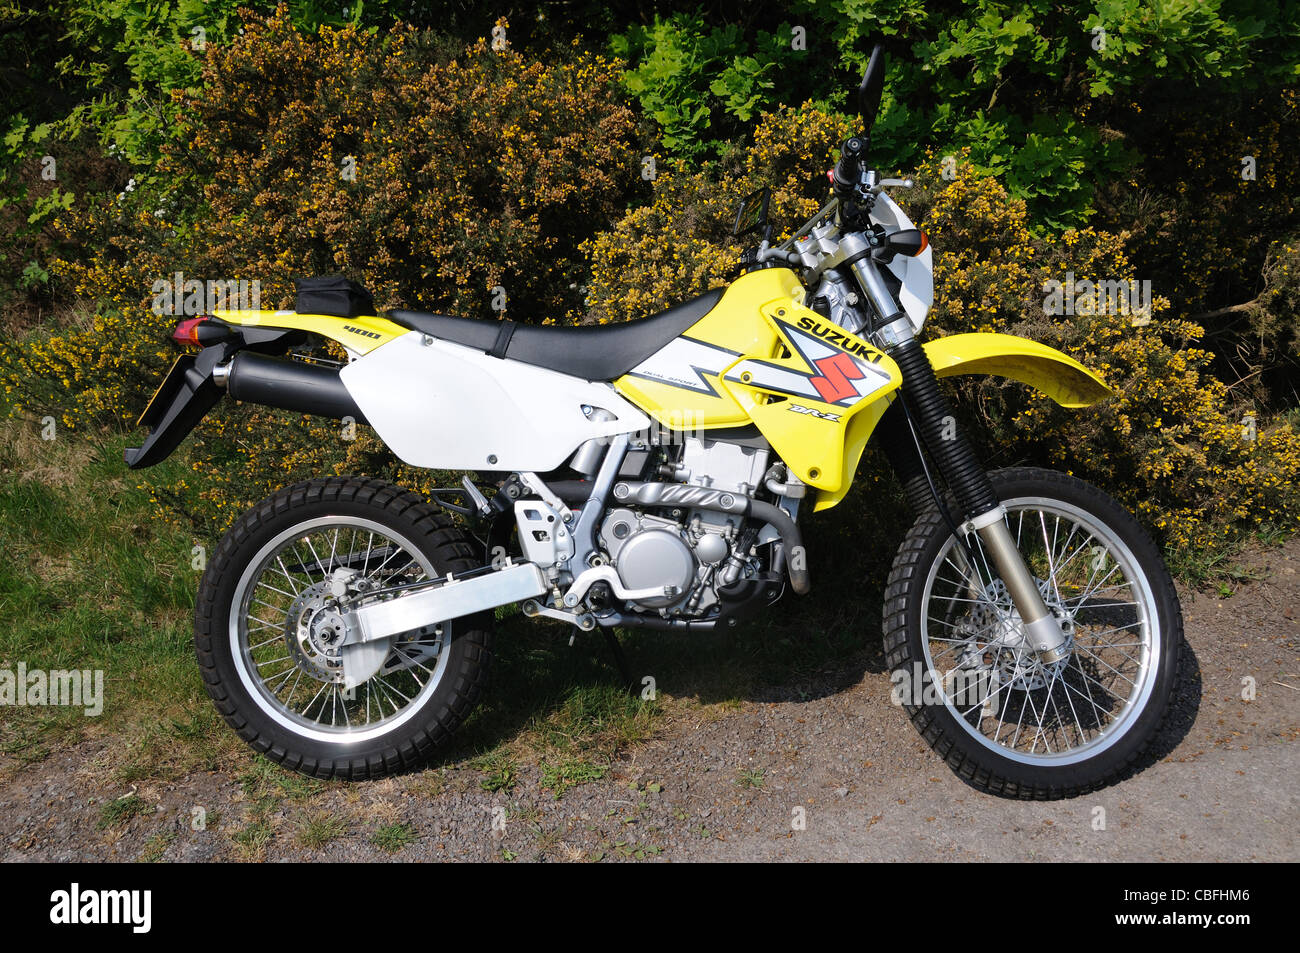 2004 Suzuki DR-Z400 'DualSport' motorcycle - Stock Image